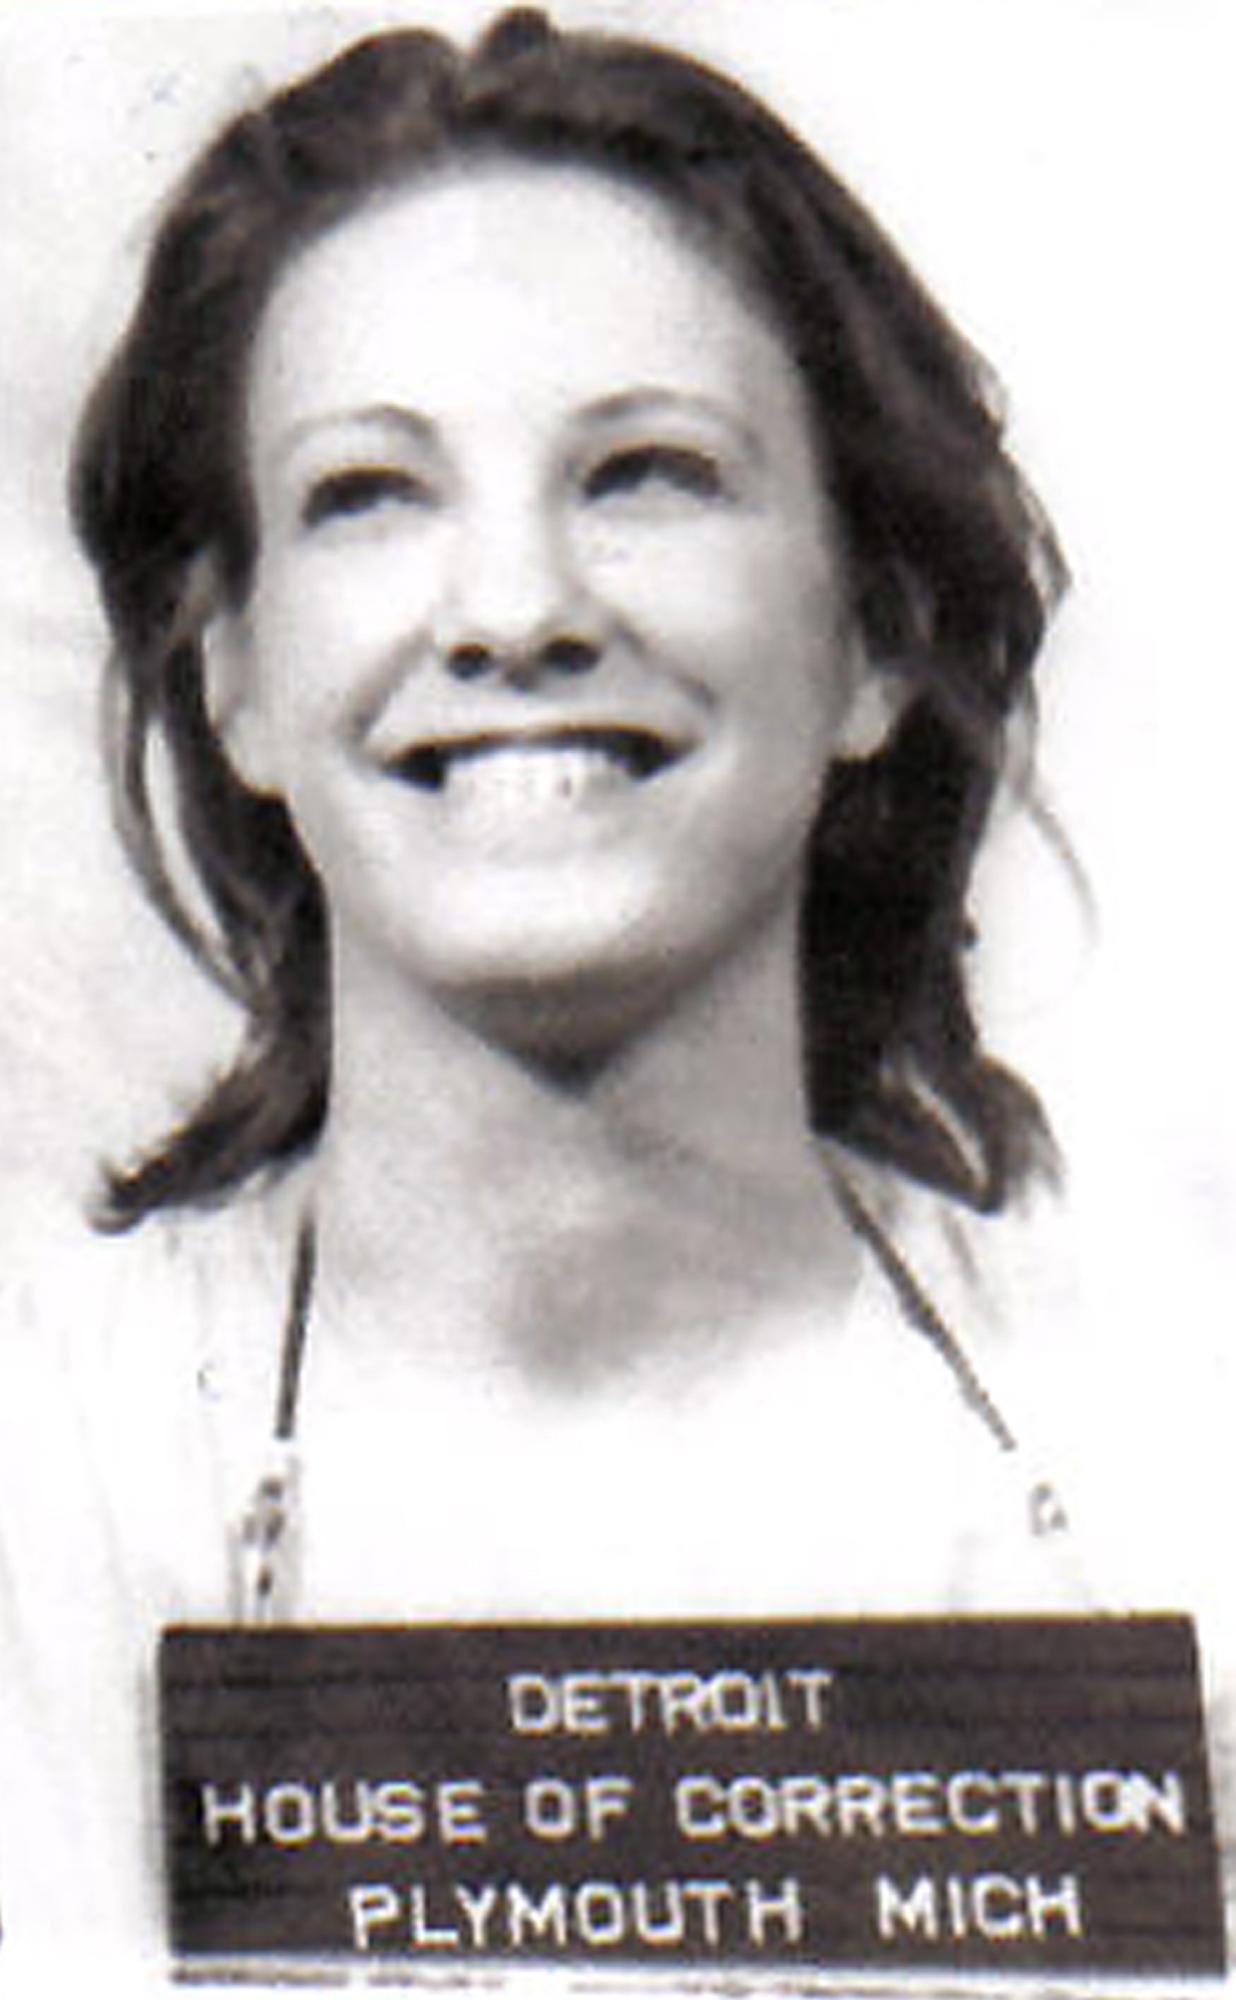 Martha Issova,Dorothy Van Erotic pictures Sinead Matthews,Marina Sirtis (born 1955 (naturalized American citizen)